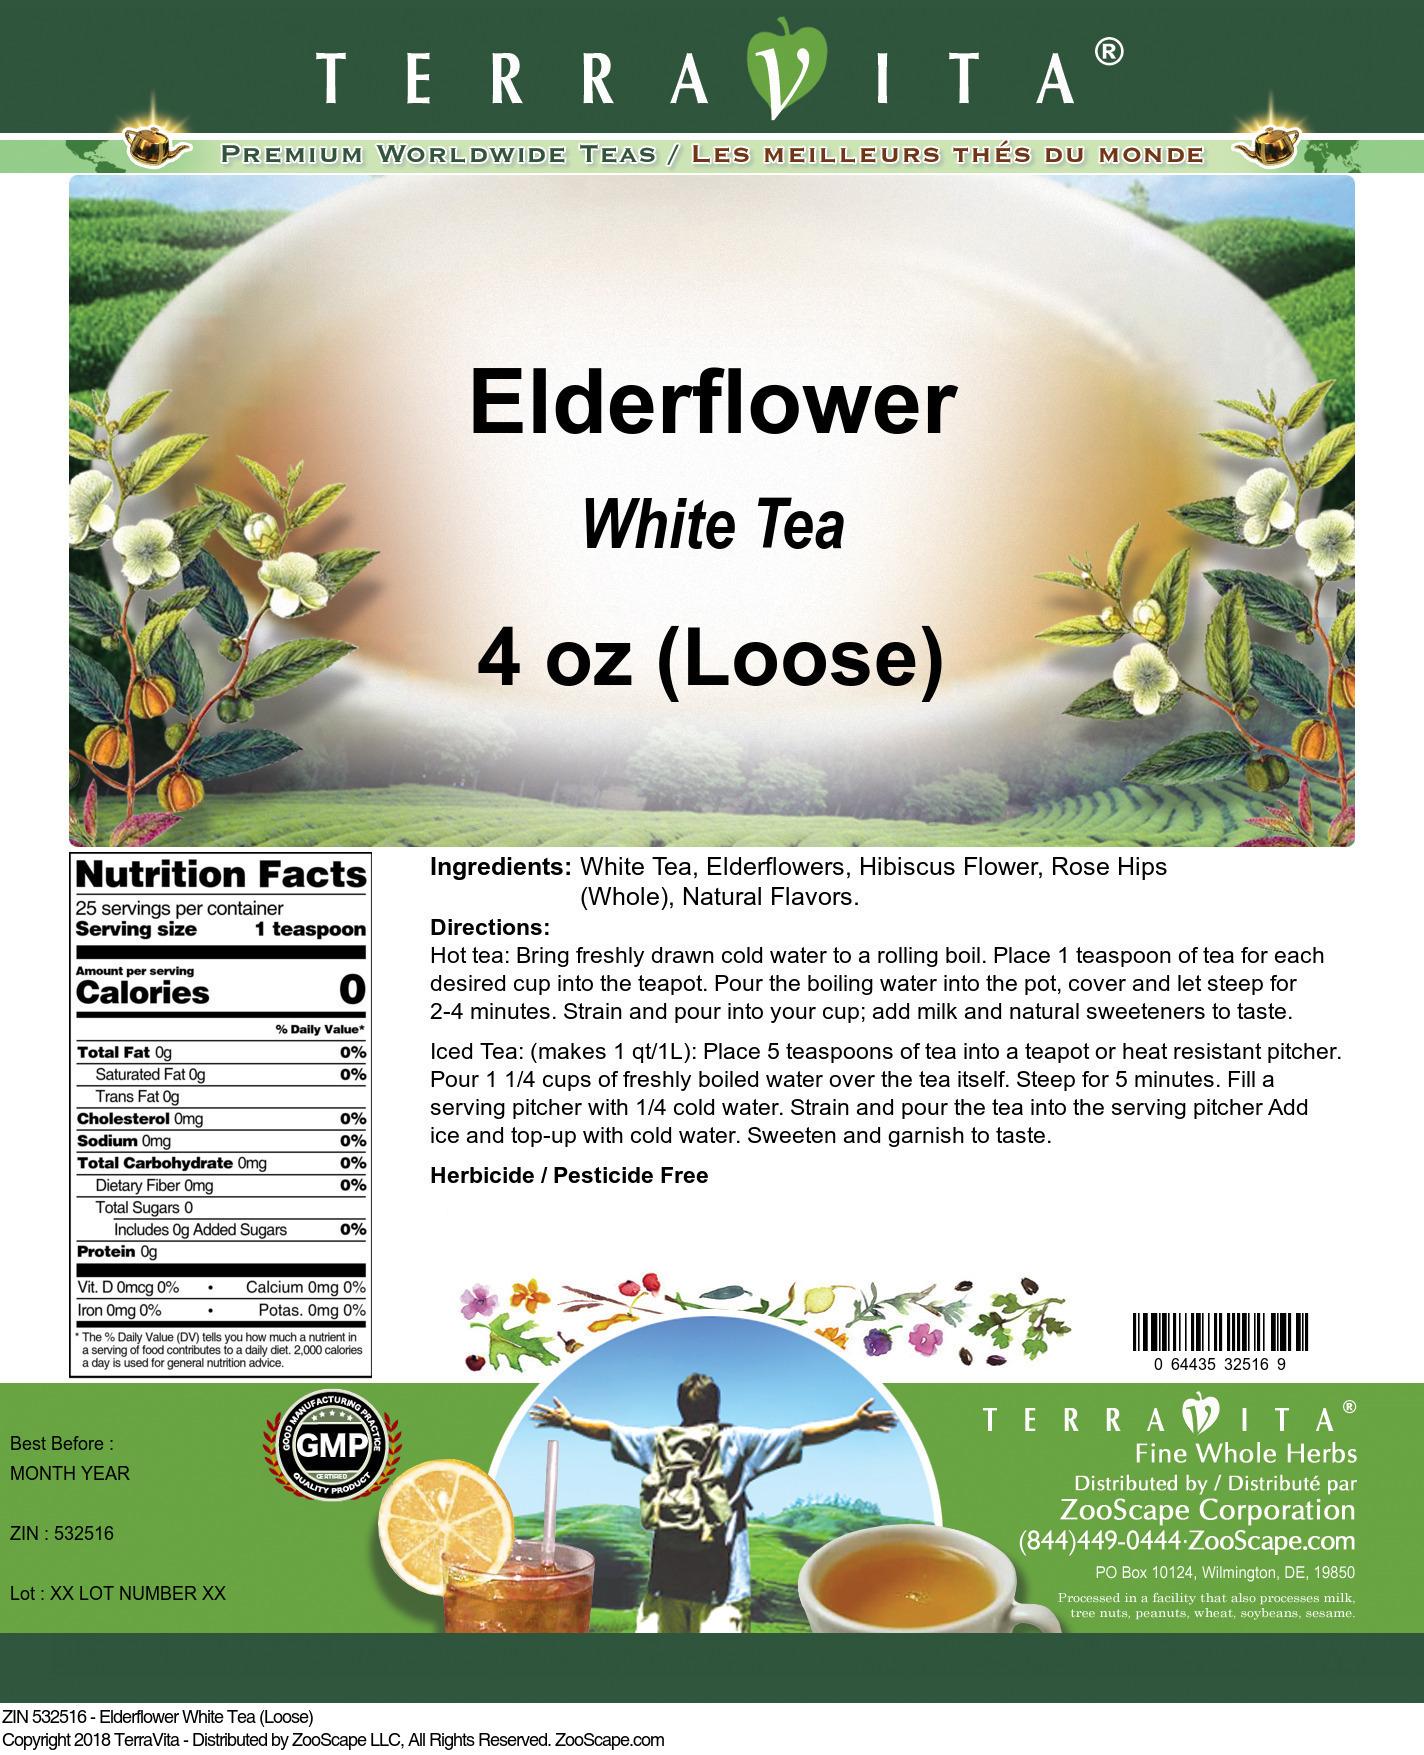 Elderflower White Tea (Loose)